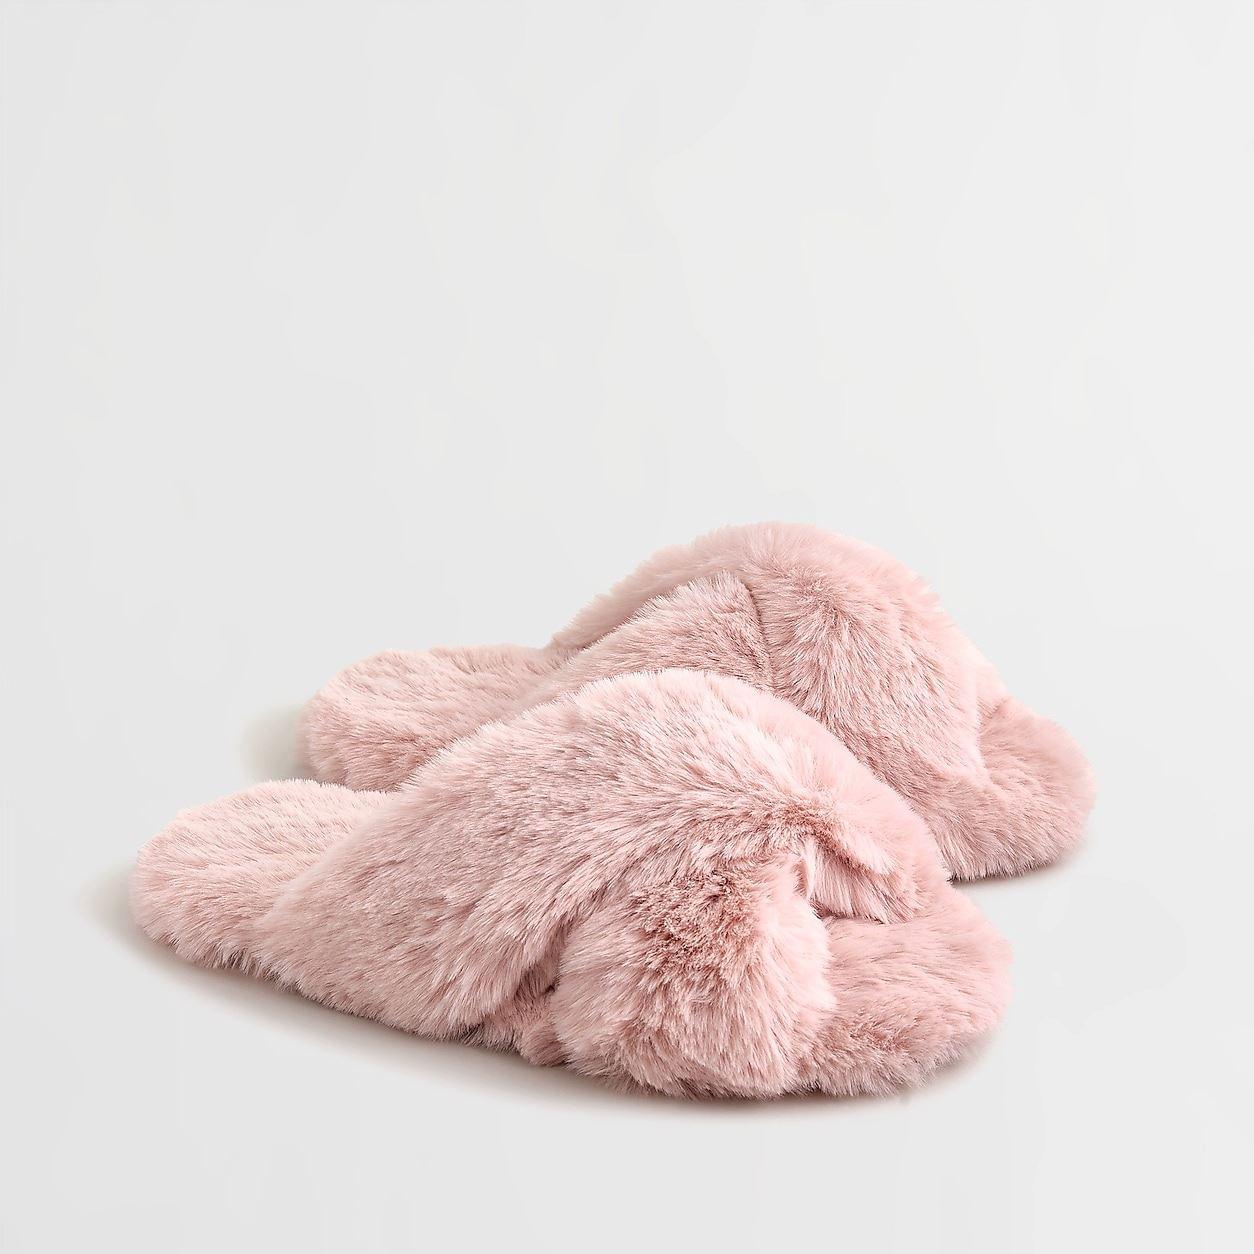 Fuzzy Criss-Cross Slippers